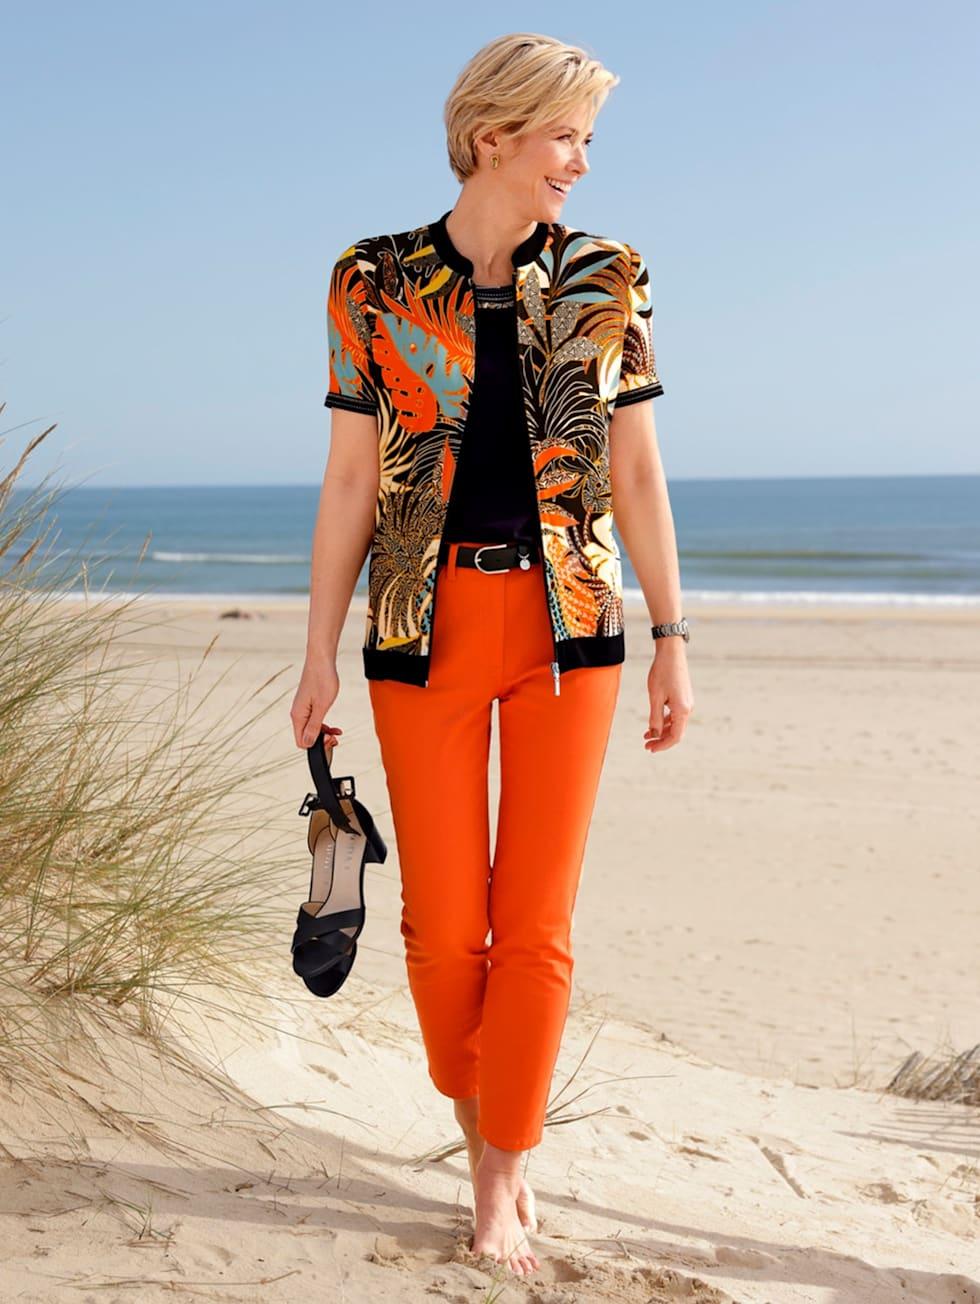 On-trend orange with bold black